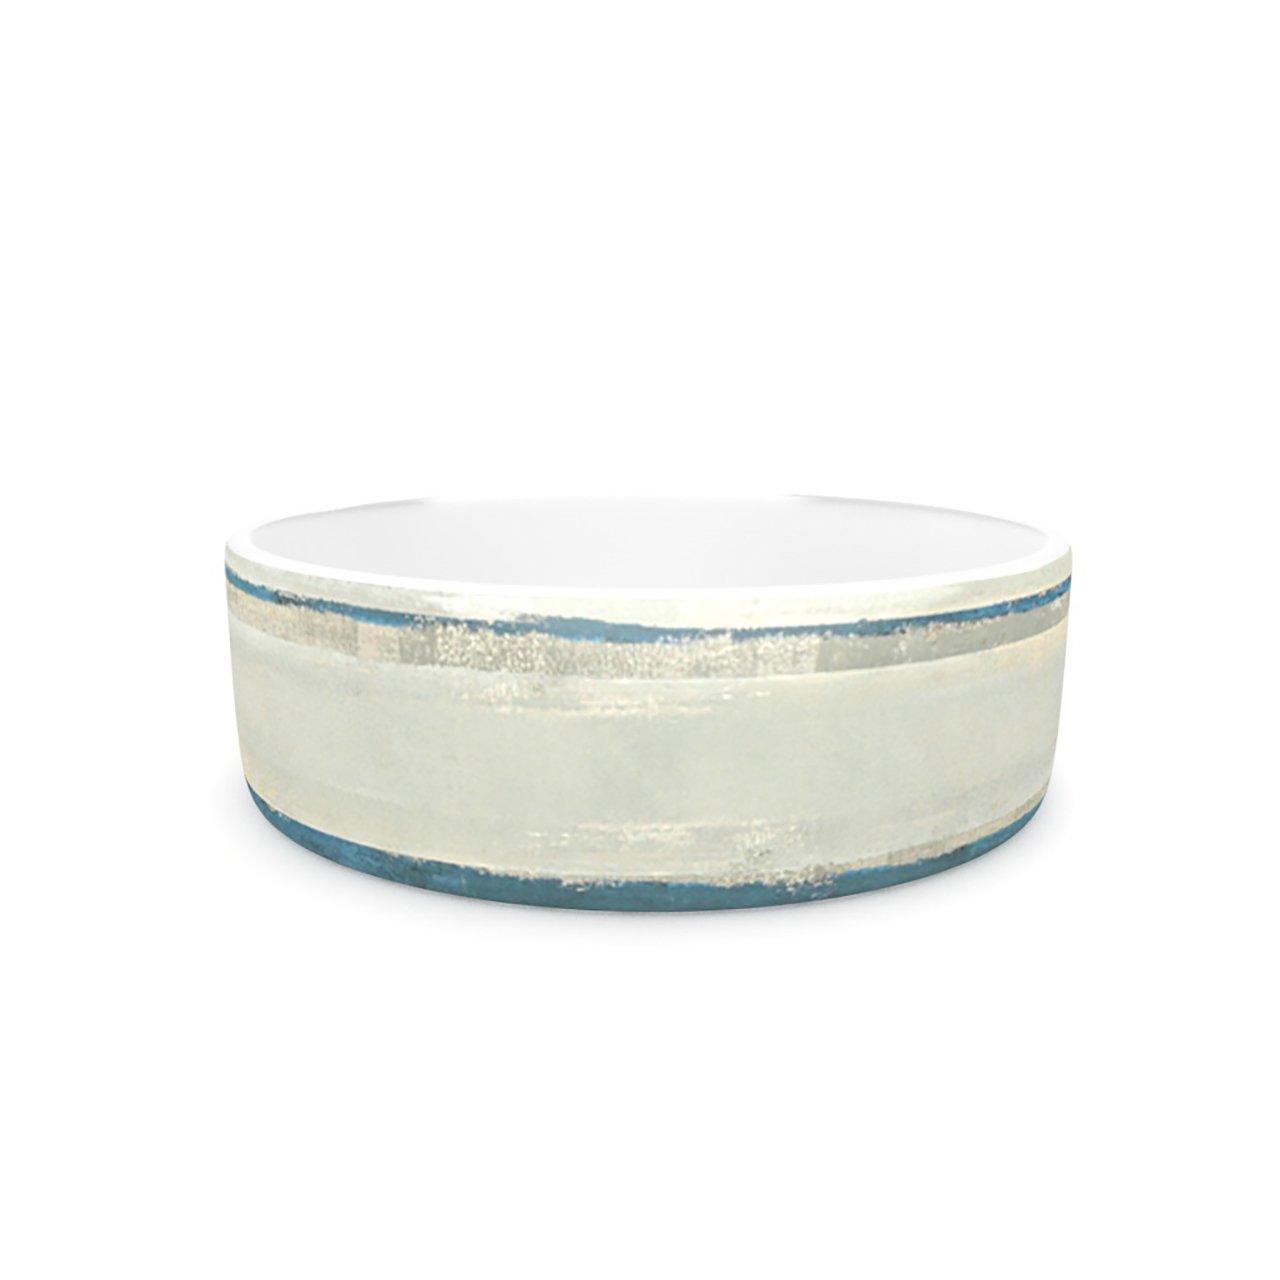 Kess InHouse CarolLynn Tice Input  Pet Bowl, 7-Inch, Light Tan